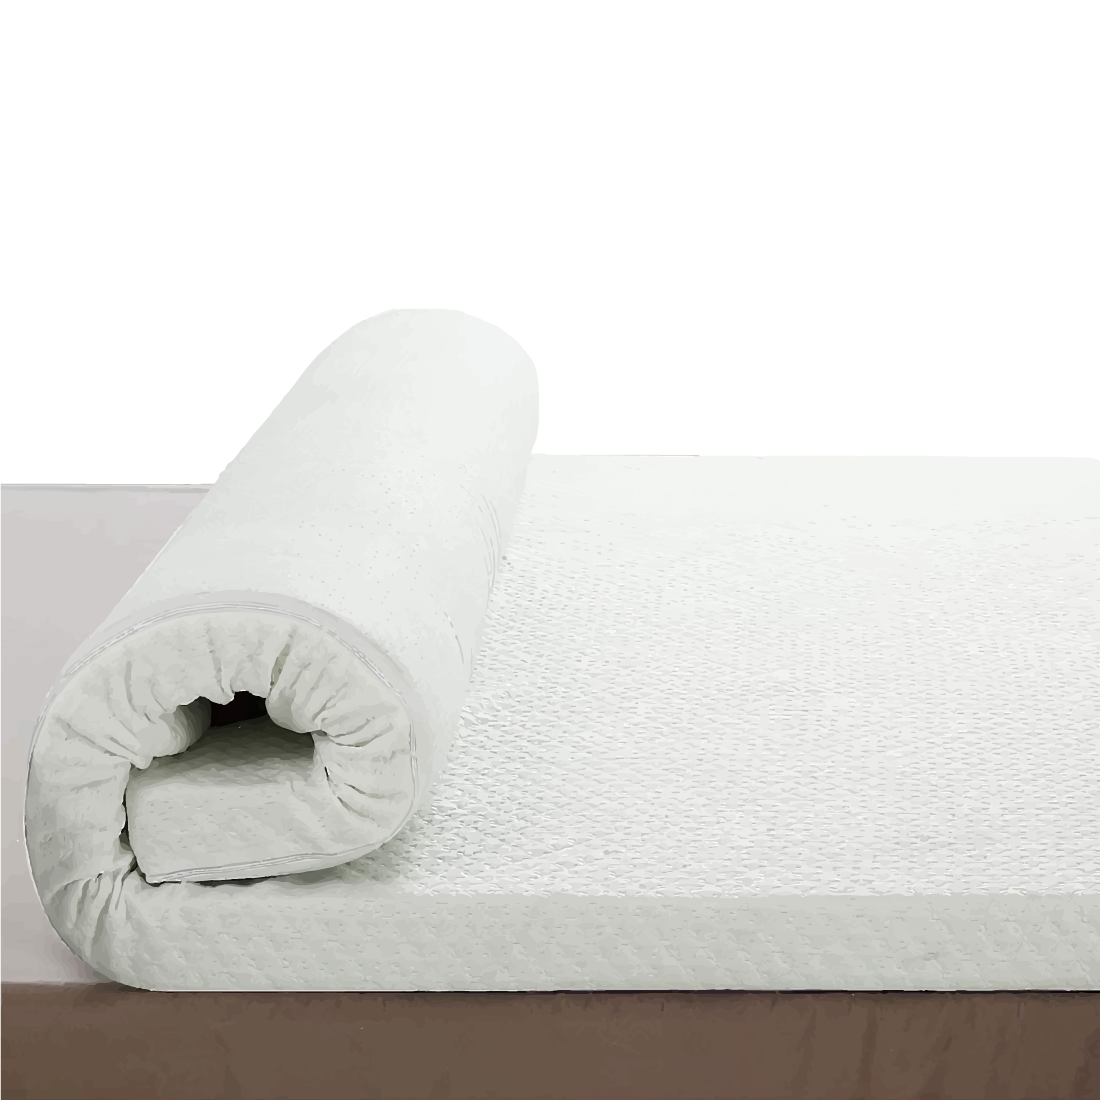 INGALIK-3-Inch-Memory-Foam-Mattress-Topper-Queen-Size-Bed-Topper